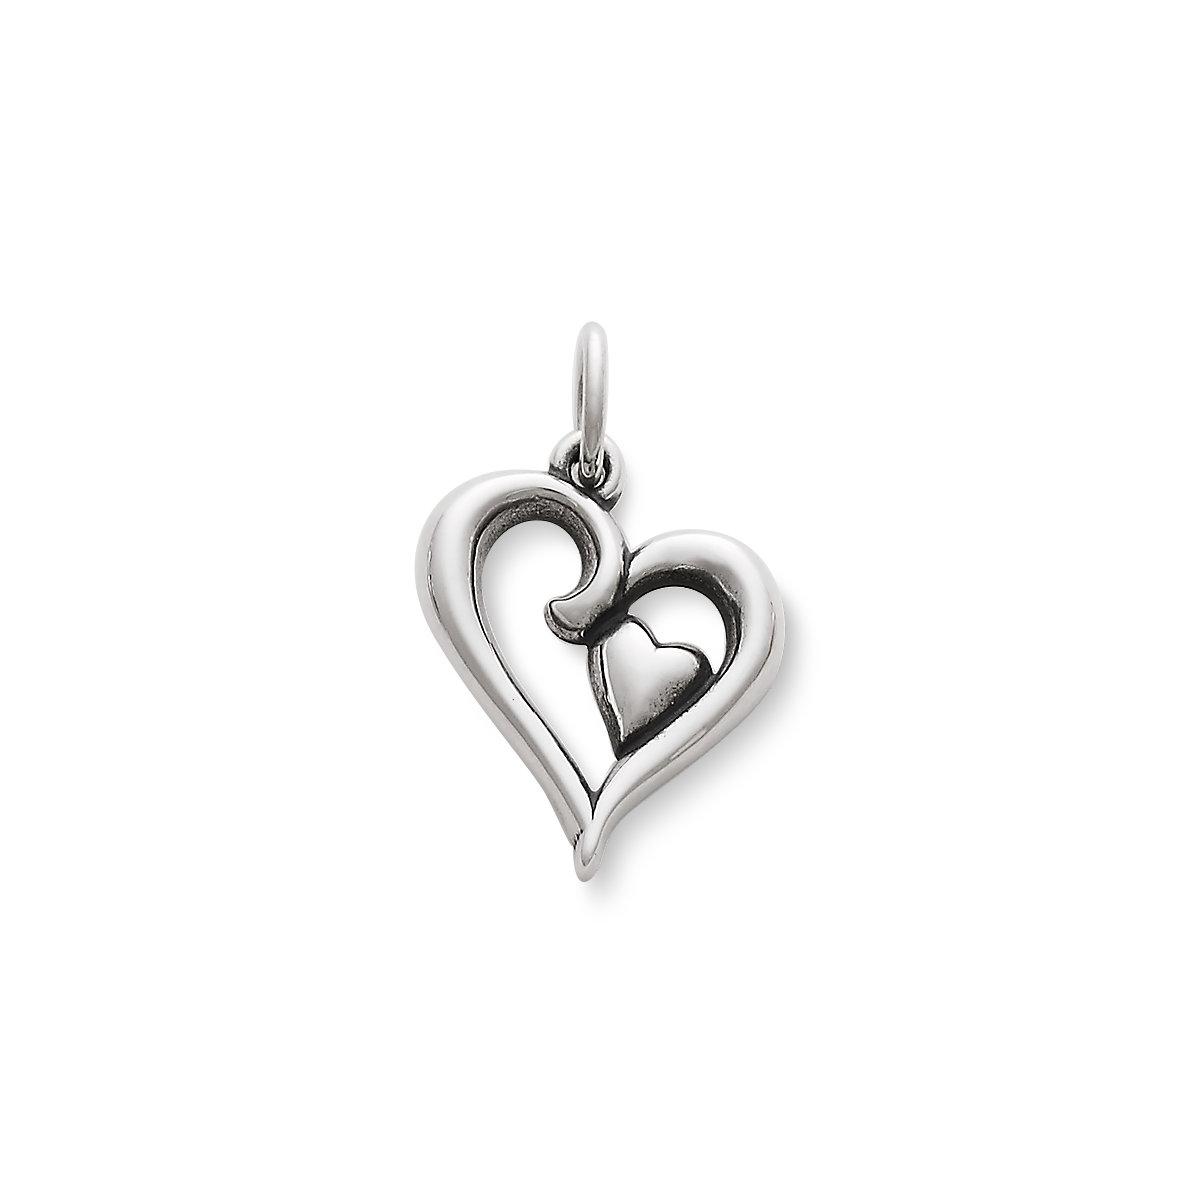 5fe82de5aa06a Joy of My Heart Charm - James Avery